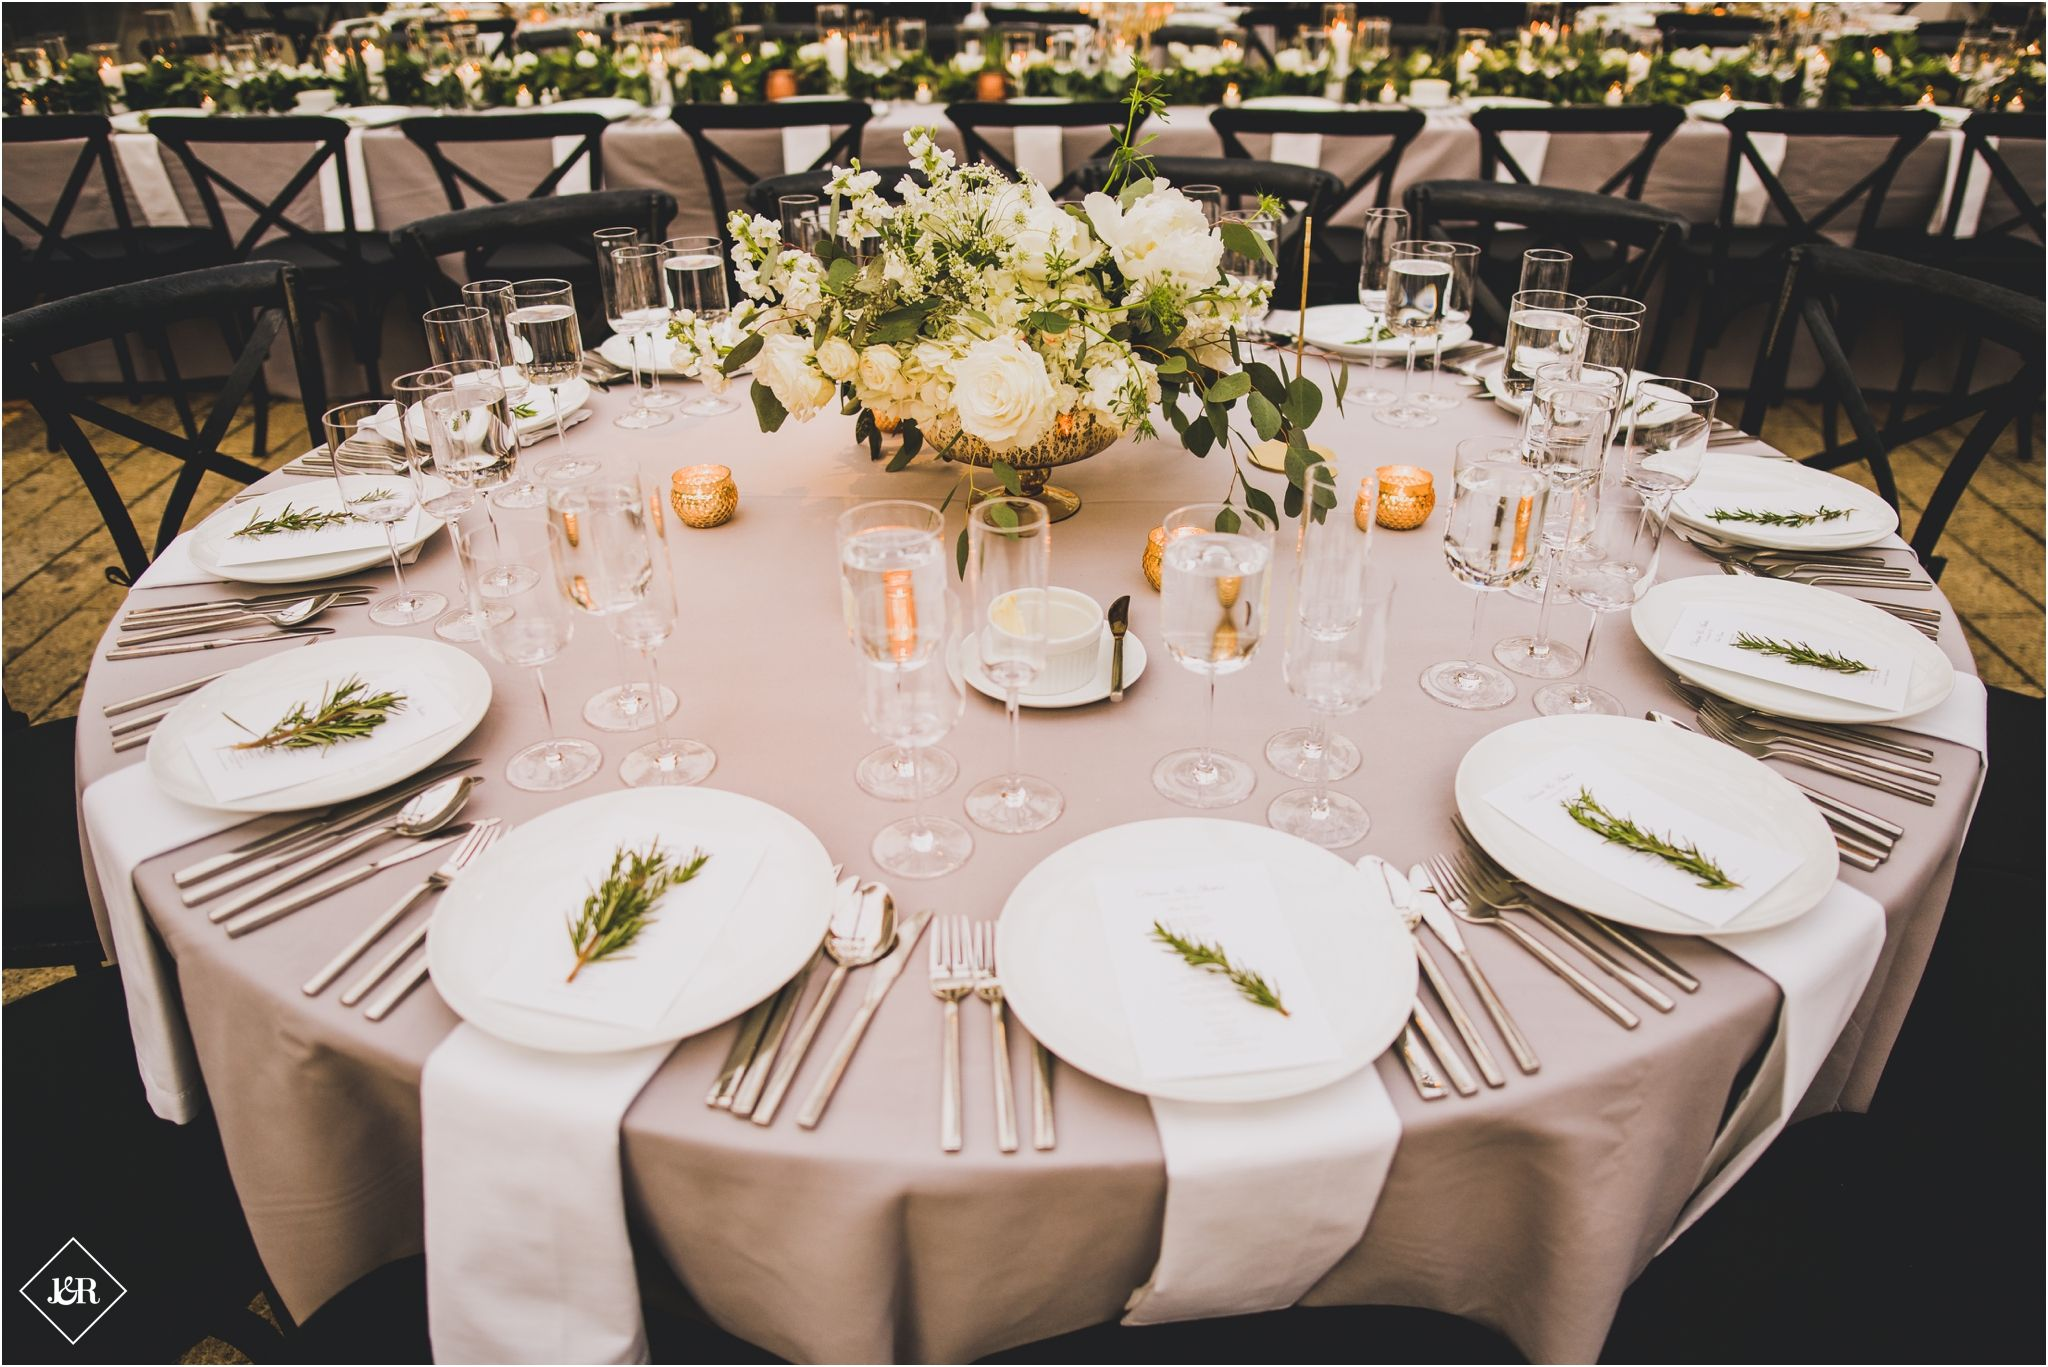 The Foundry Wedding Wedding reception decorations